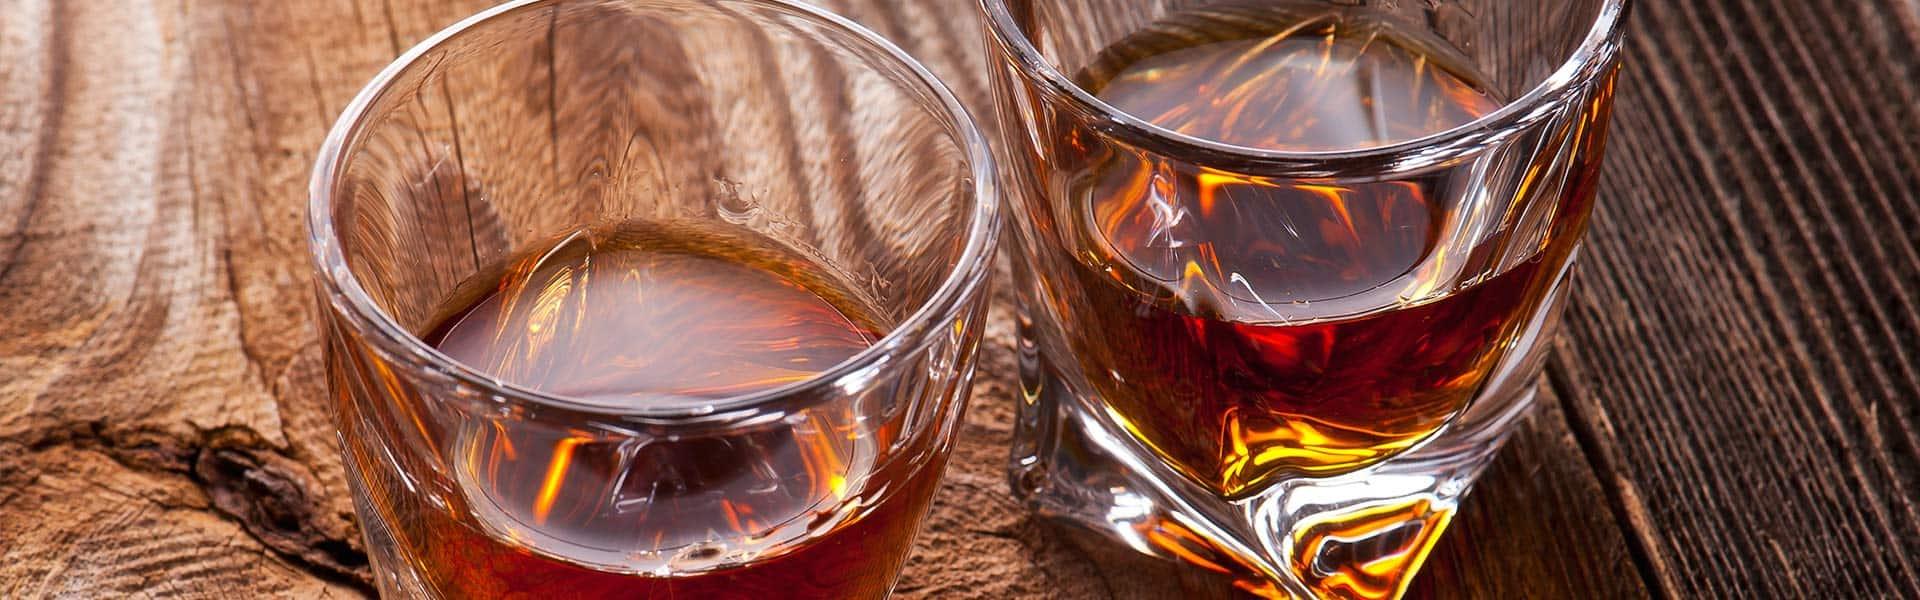 Weinkellerei Meraner Whisky